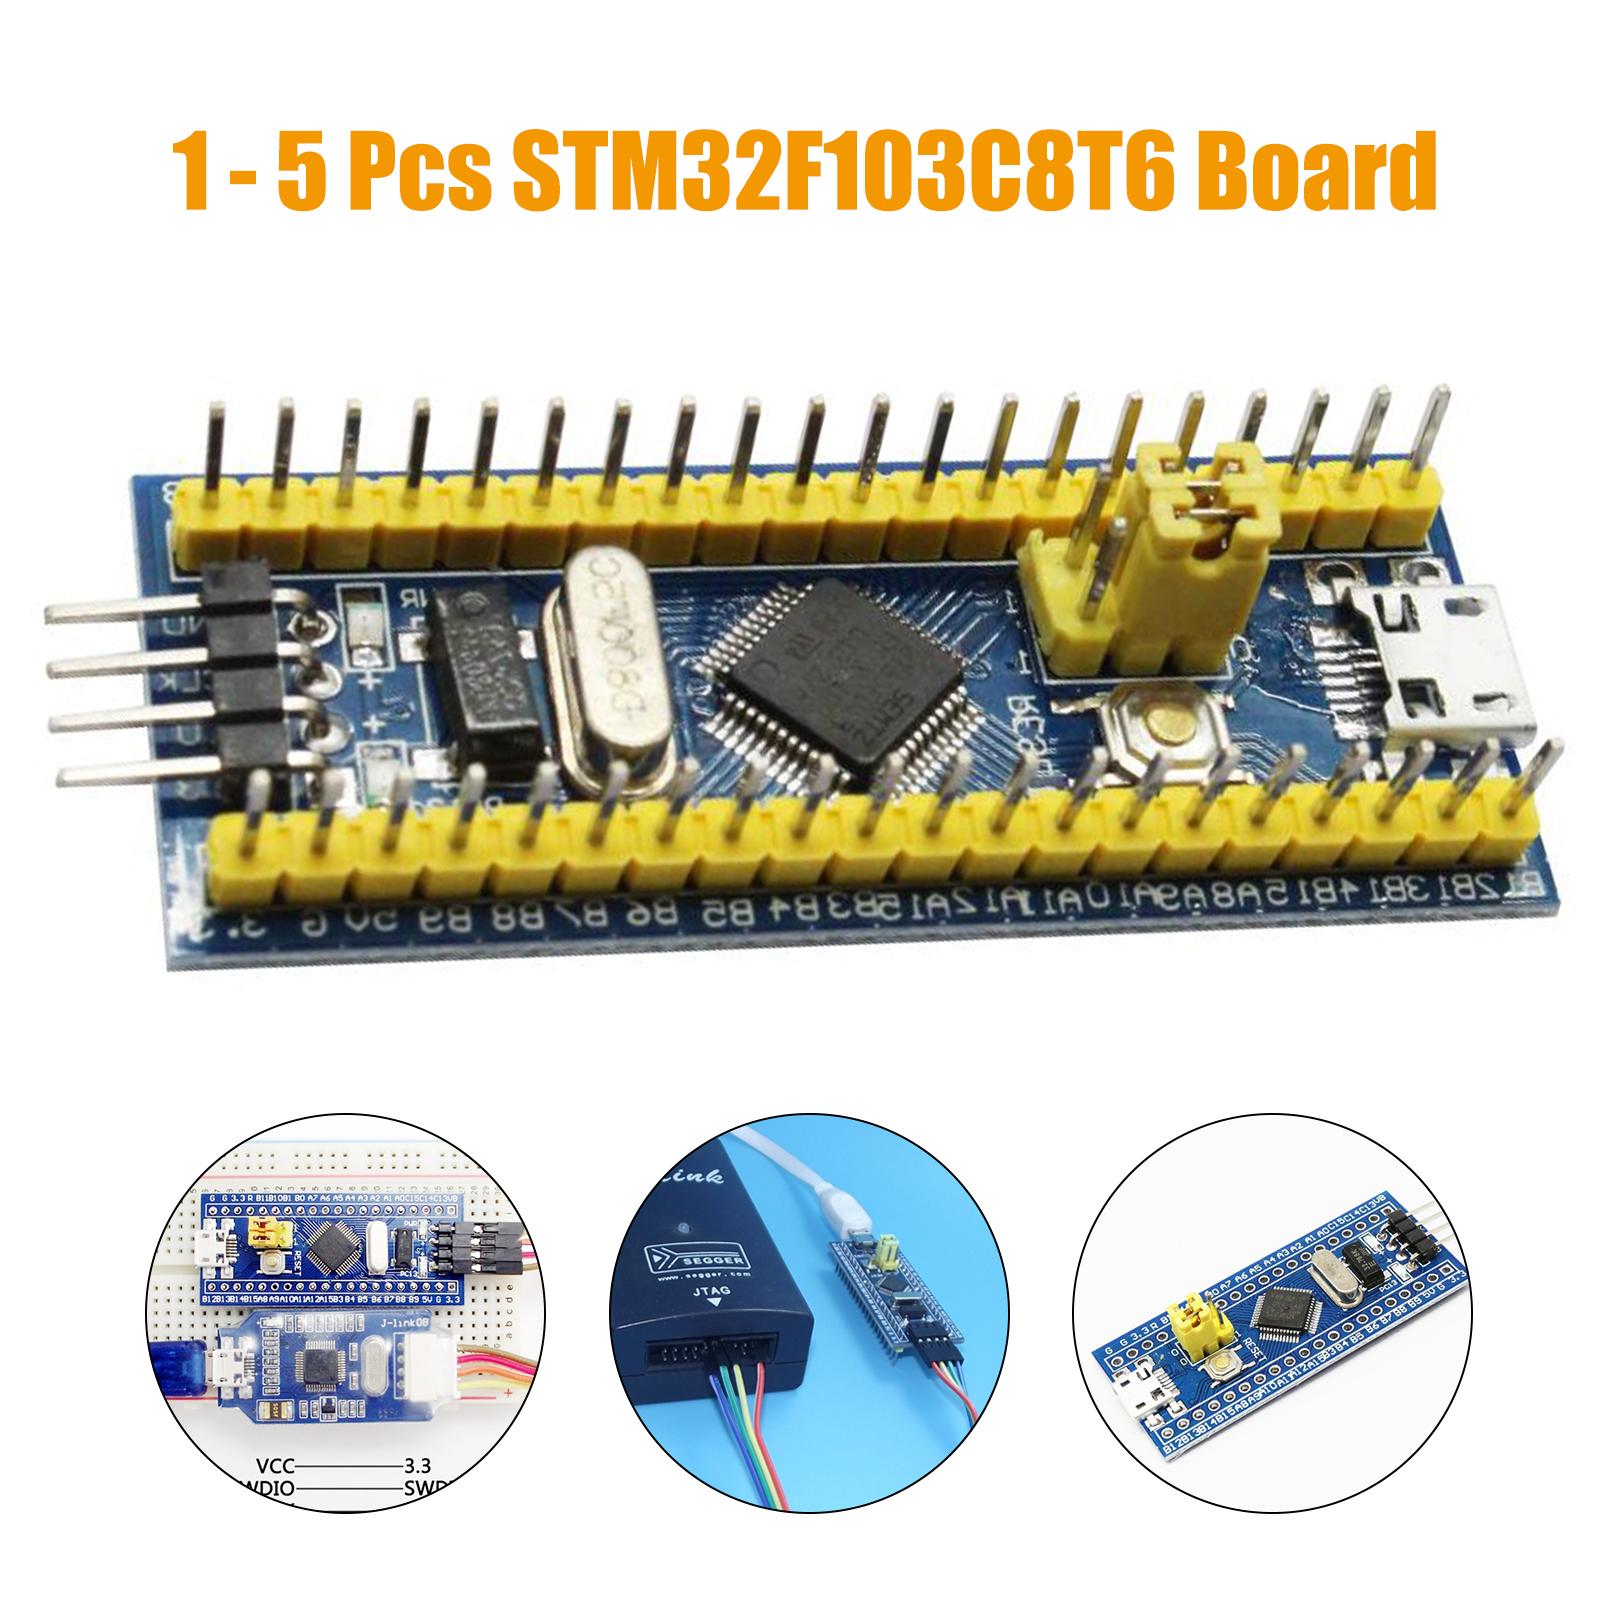 Details about 1-5x STM32F103C8T6 ARM STM32 Minimum System Development Board  Module for Arduino